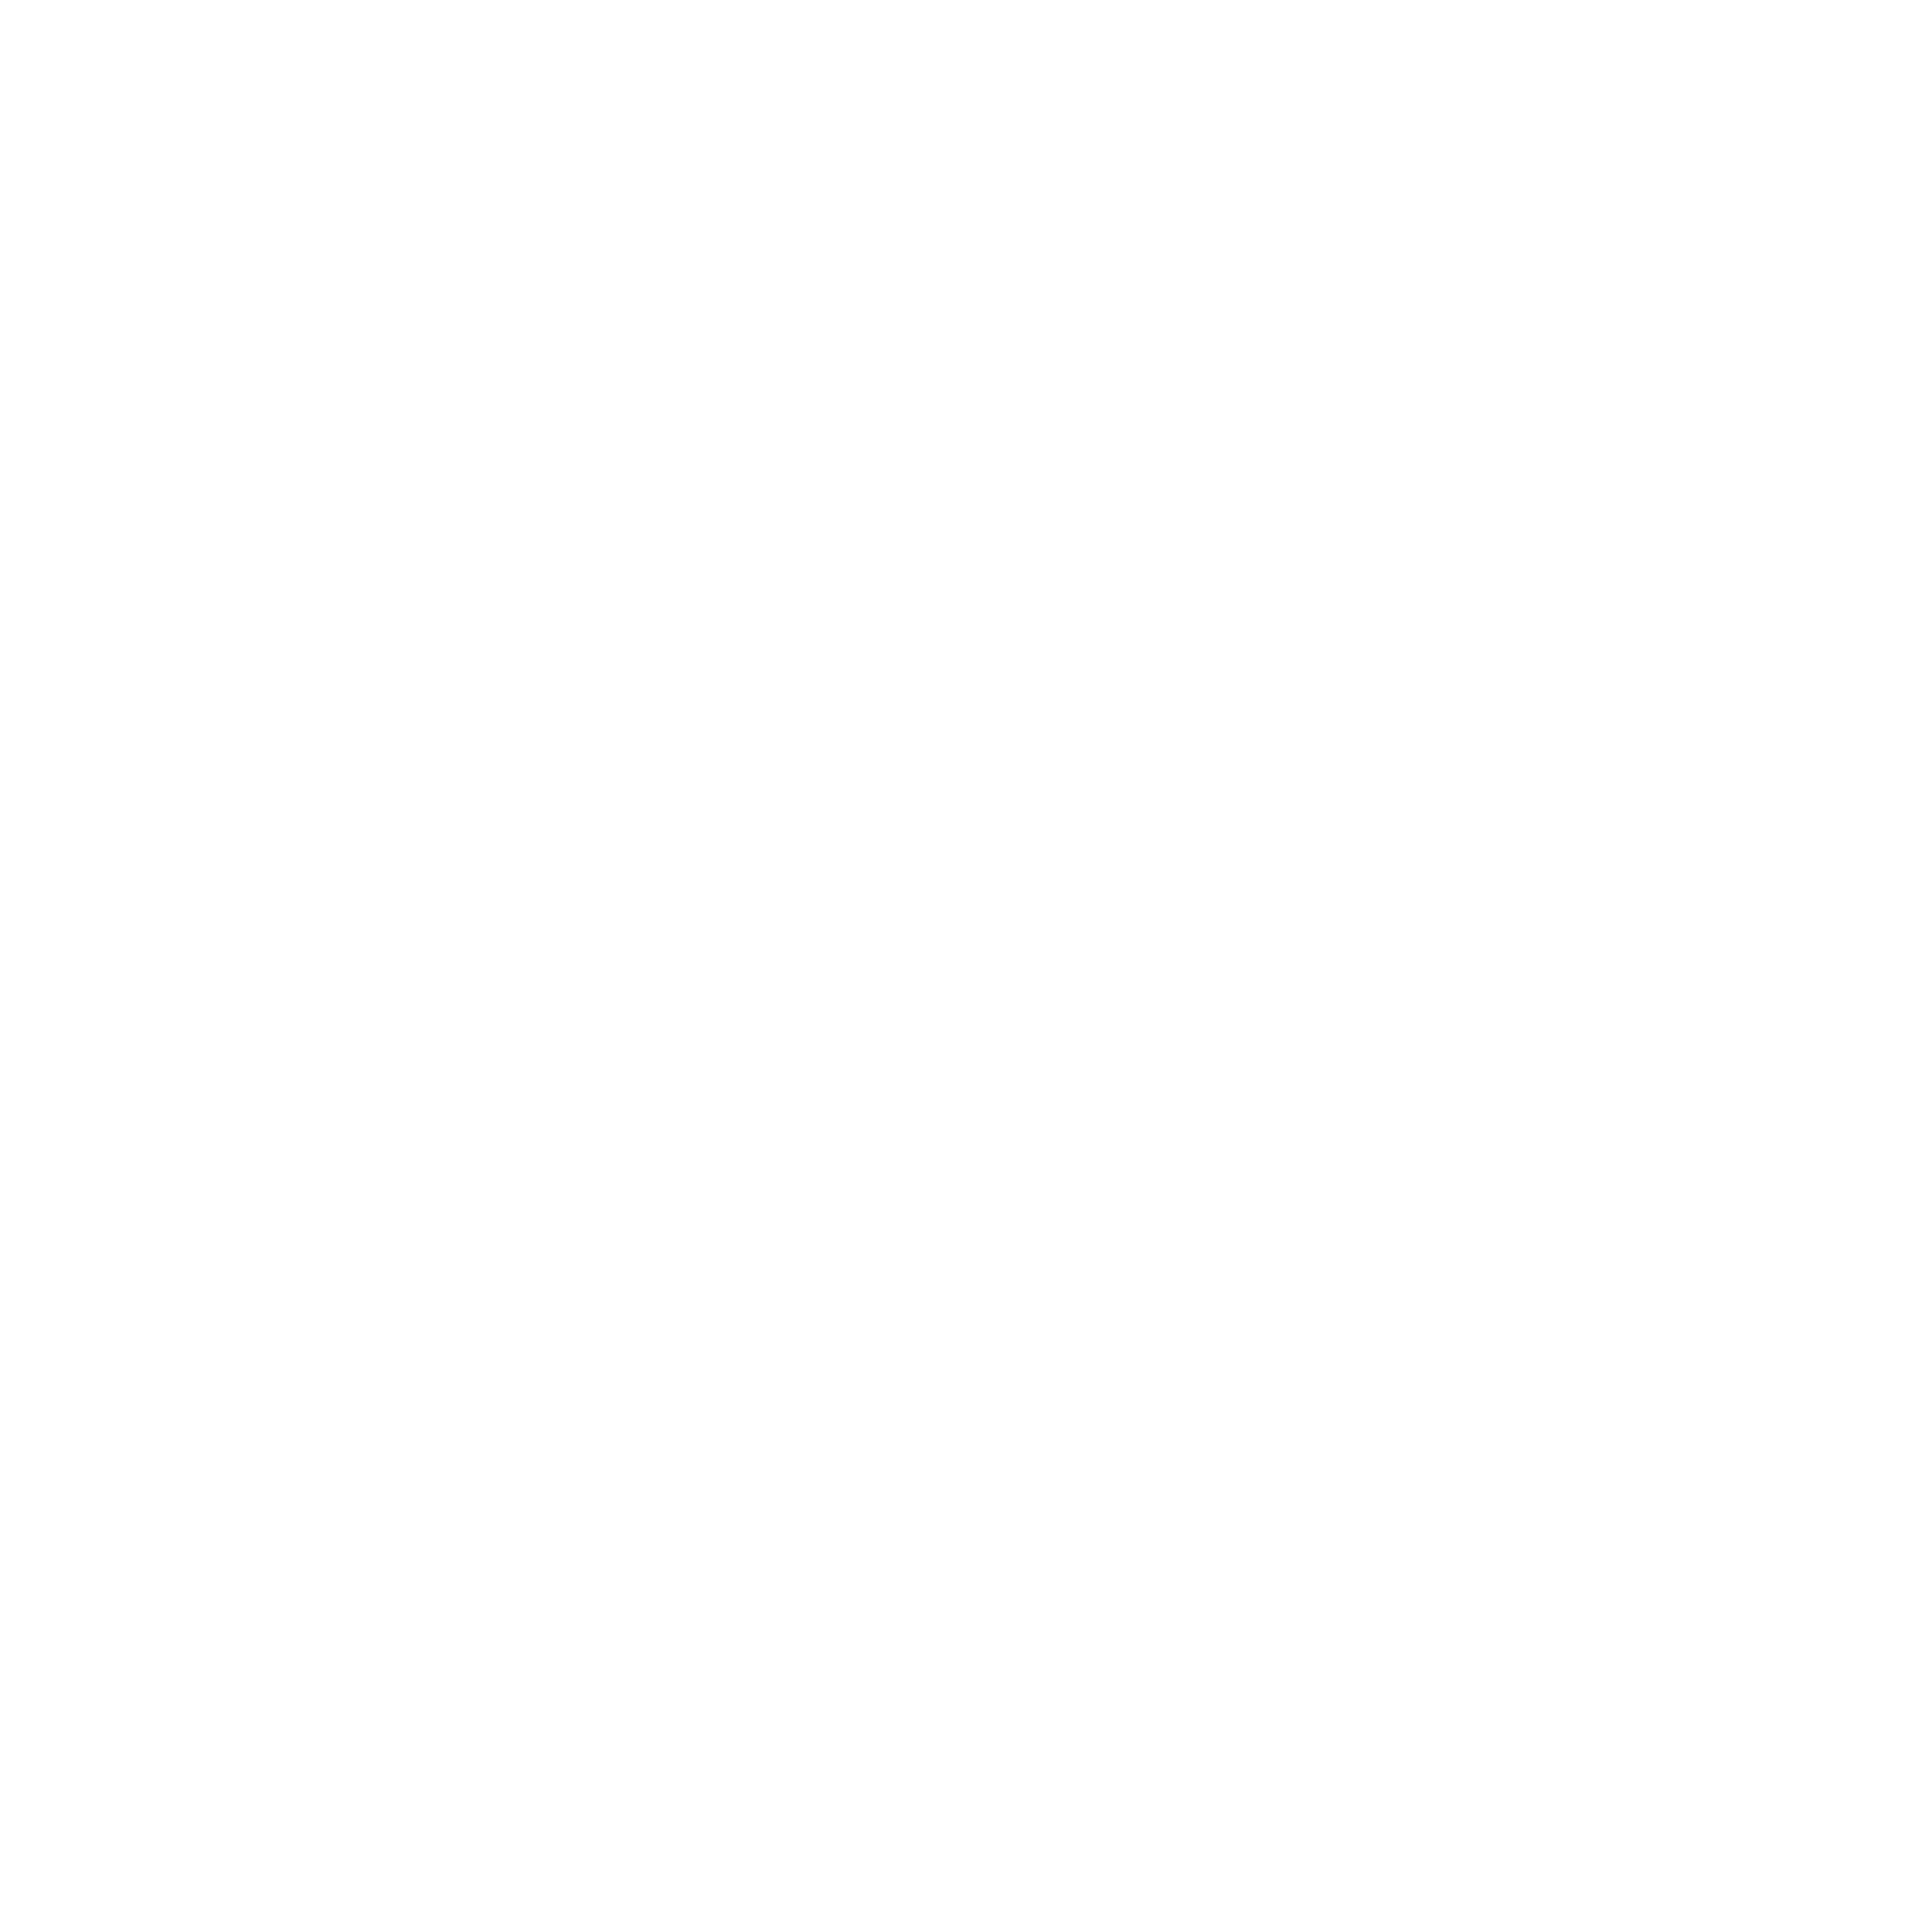 mh-white-favicon-rgb